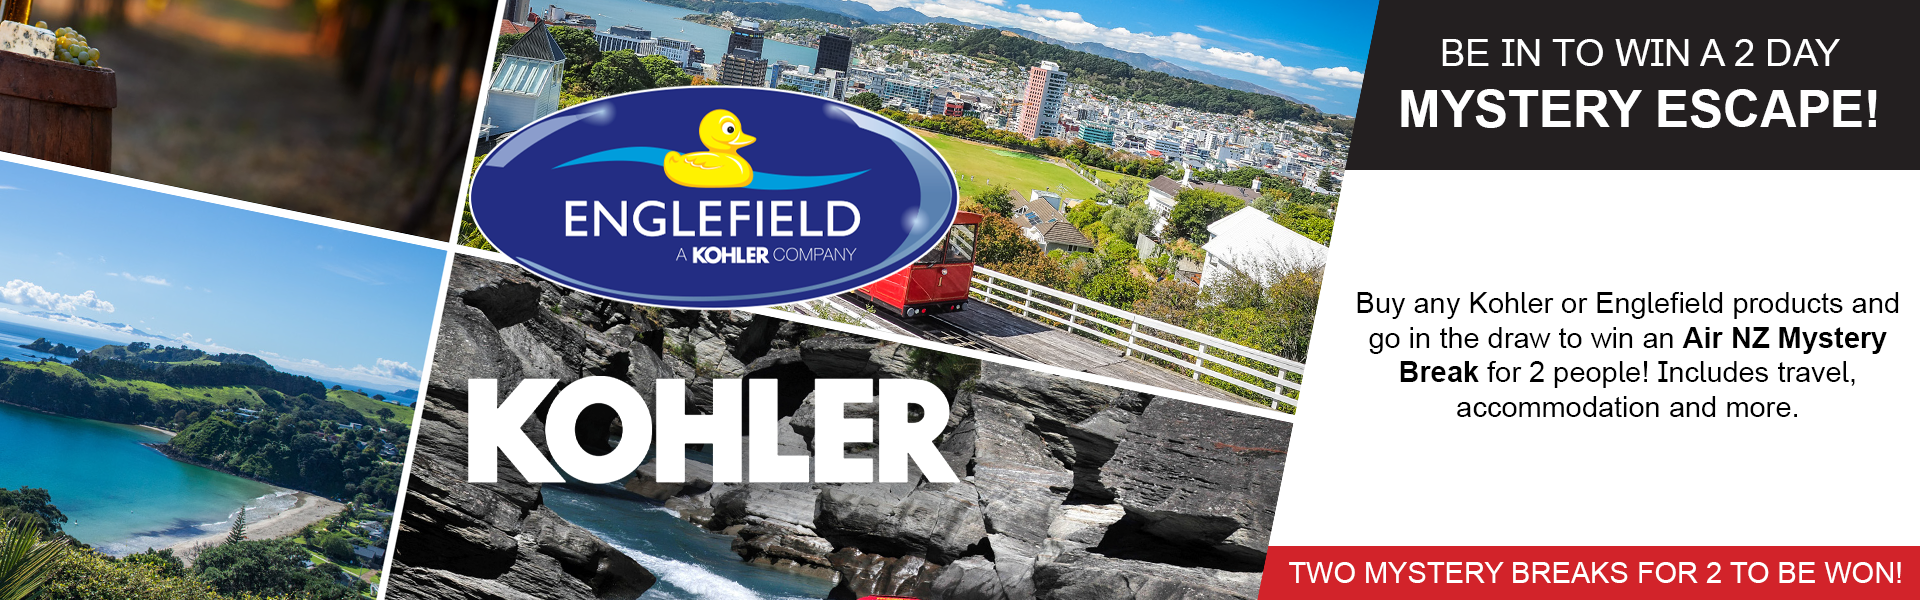 Englefield Kohler Mystery Break Promo